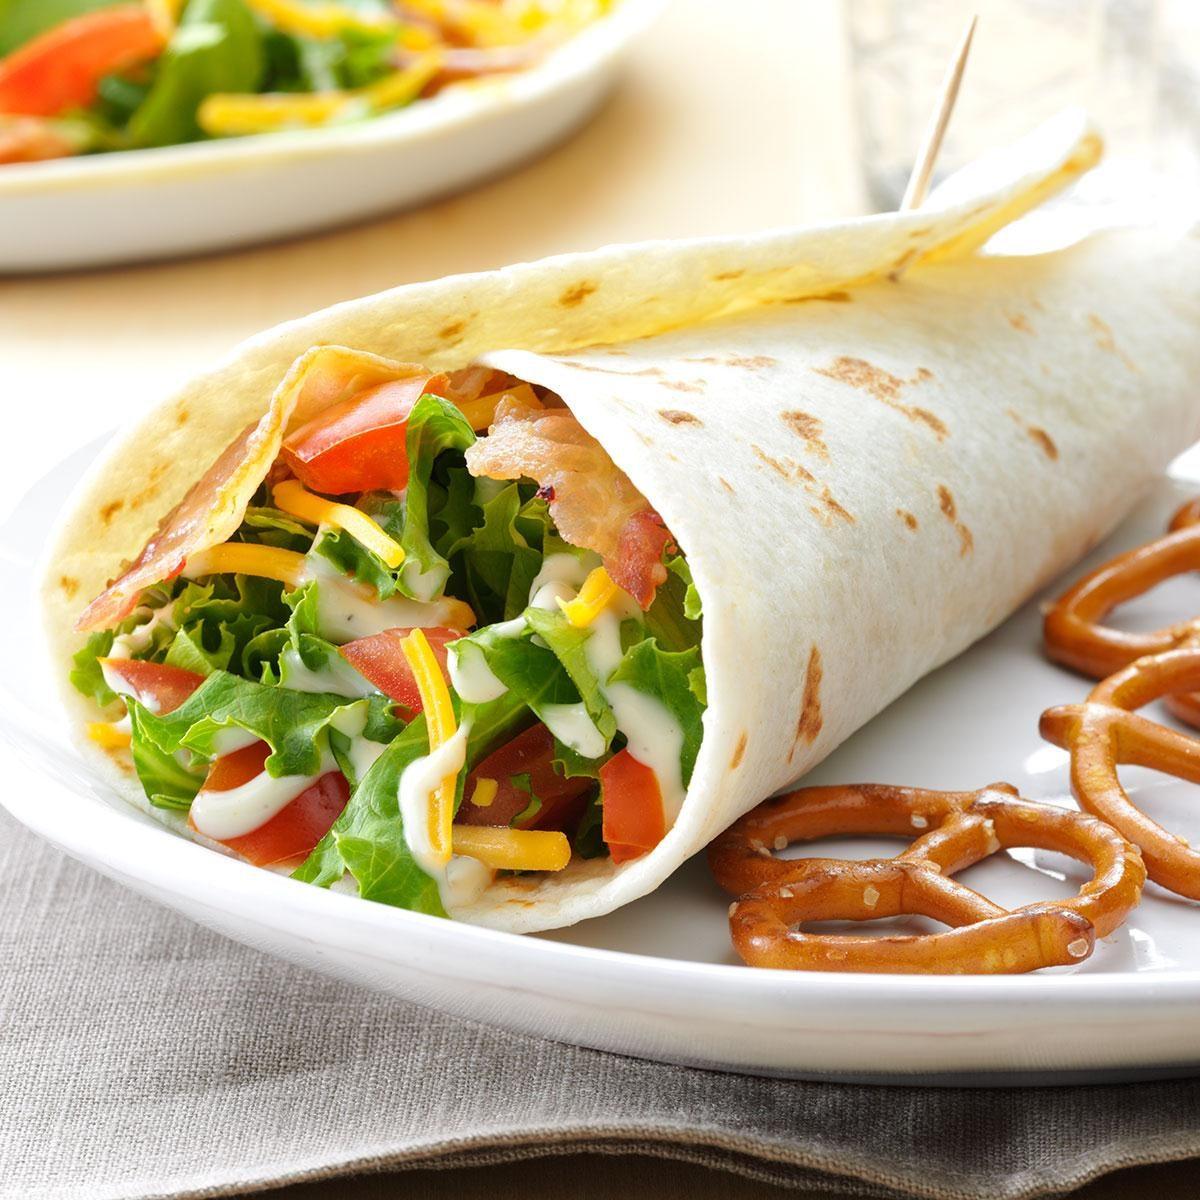 40 Brown Bag Lunch Ideas for September